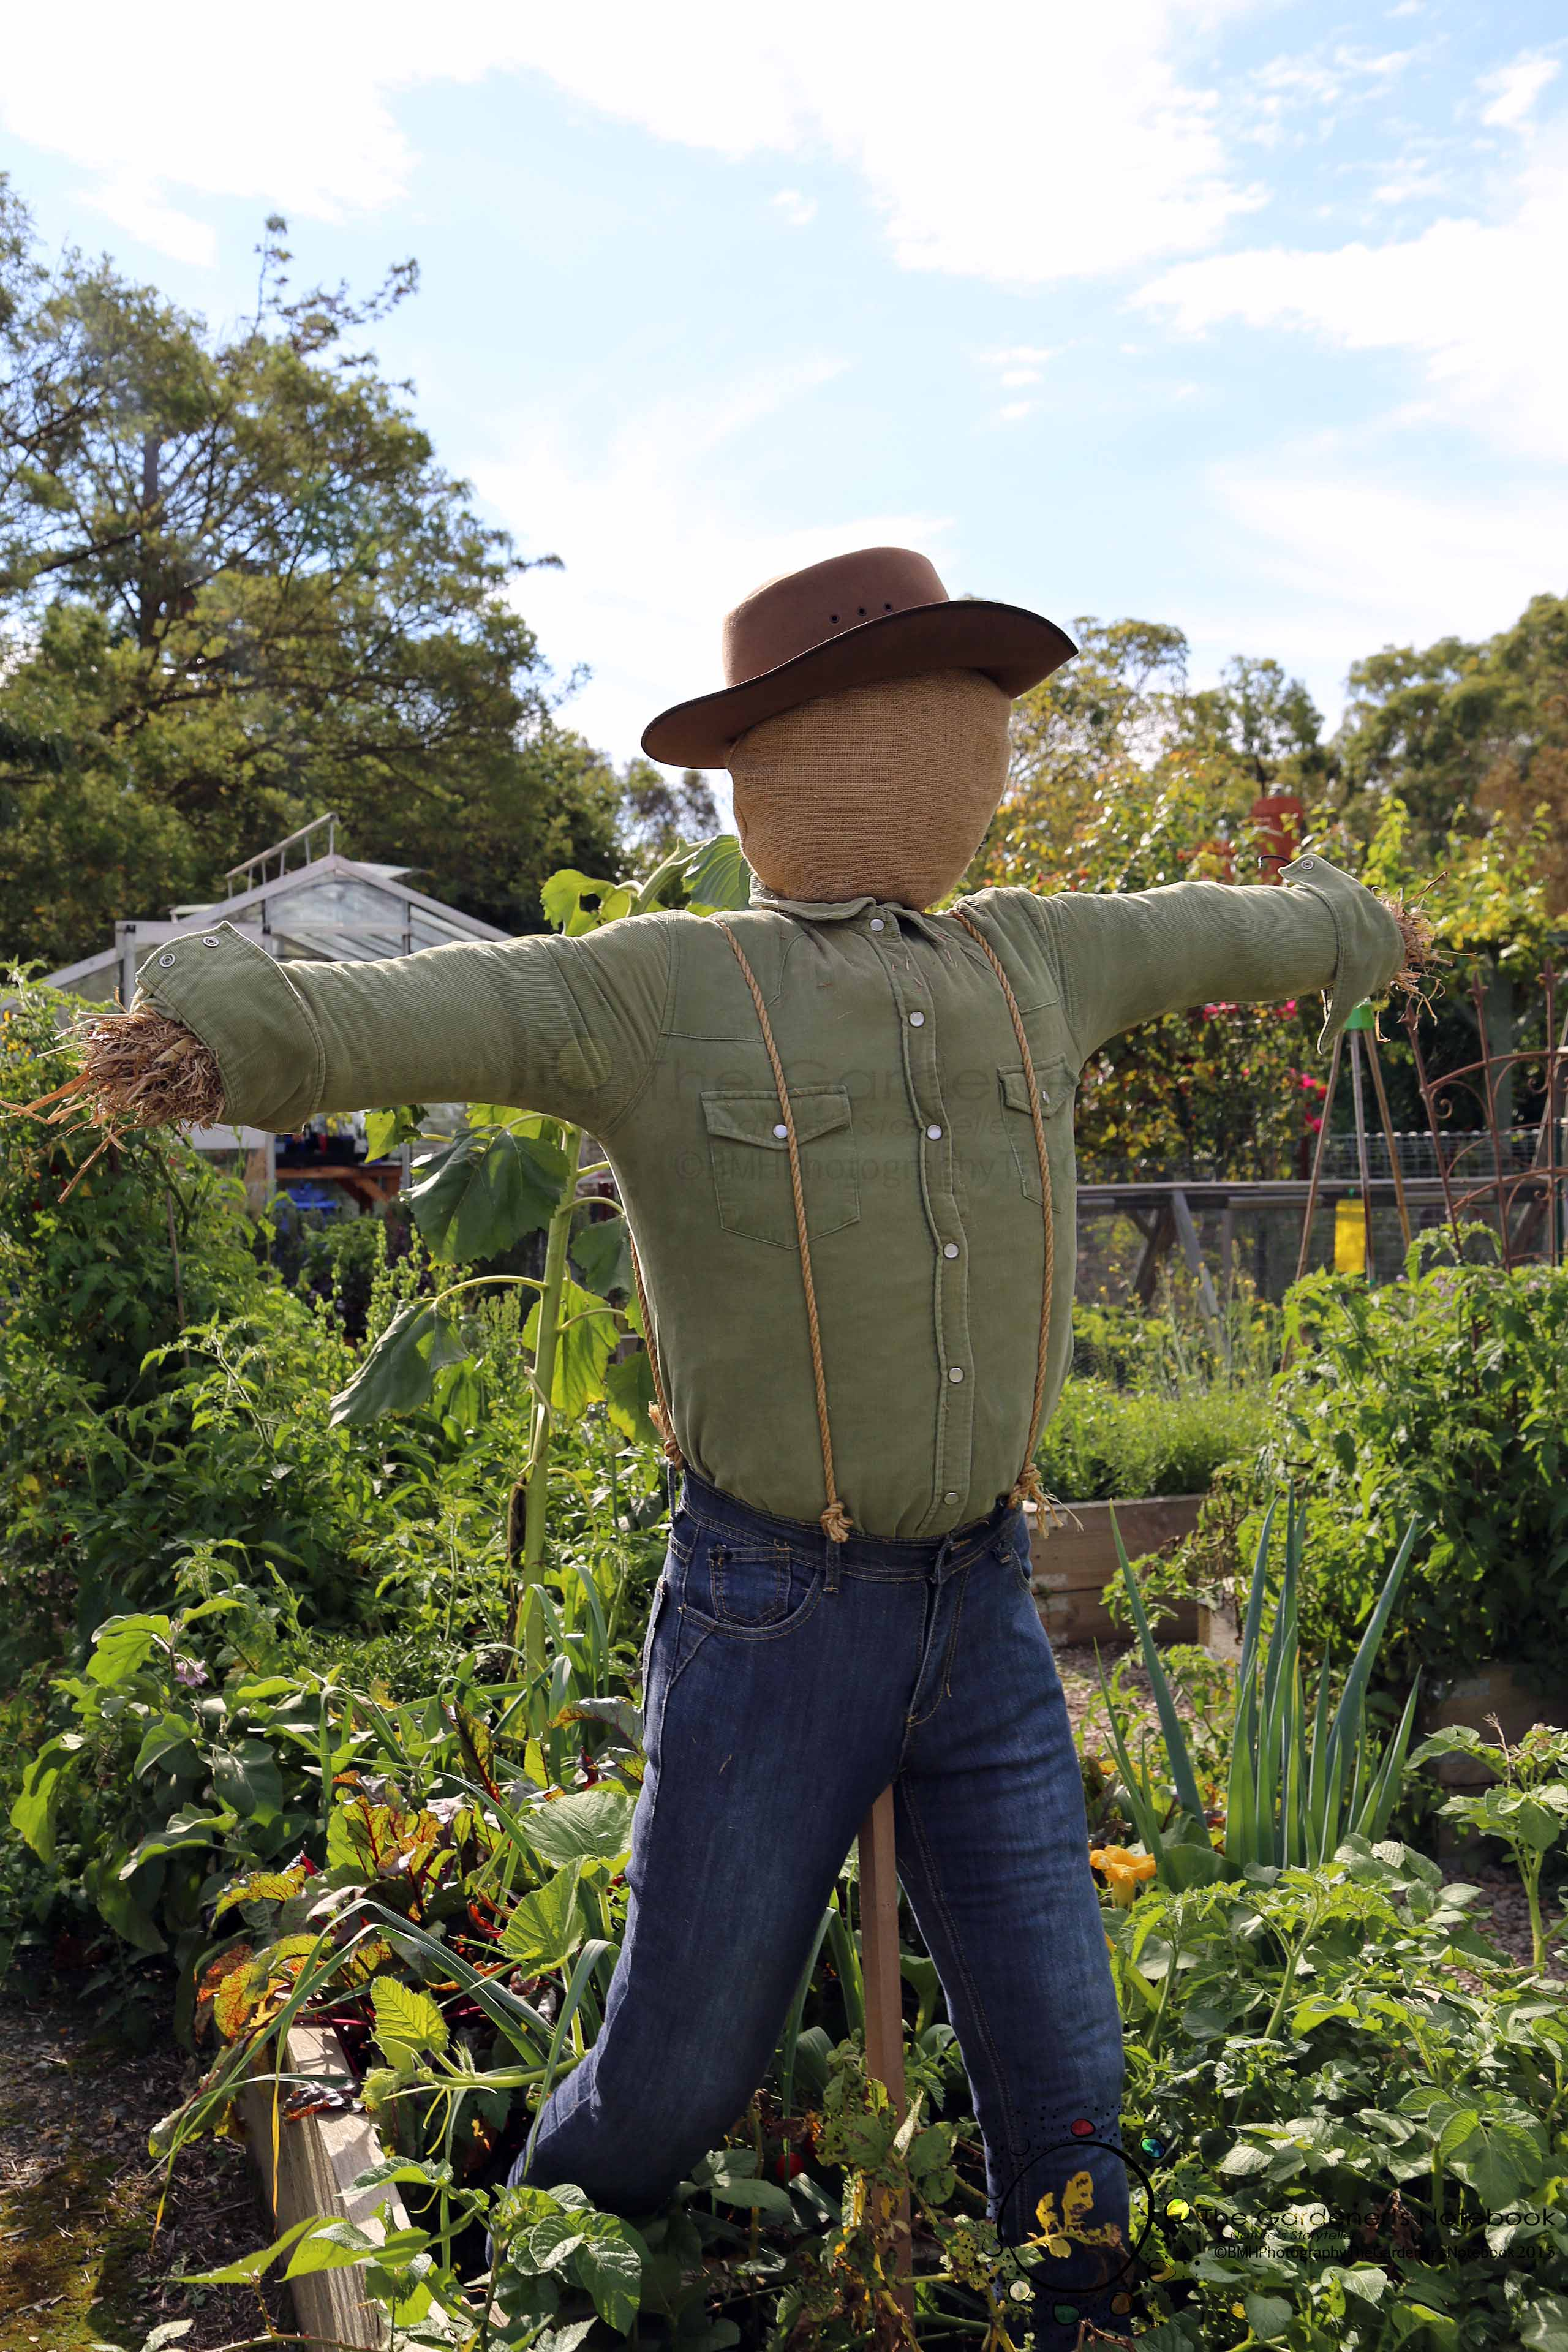 Diy How To Building A Scarecrow The Gardener S Notebook